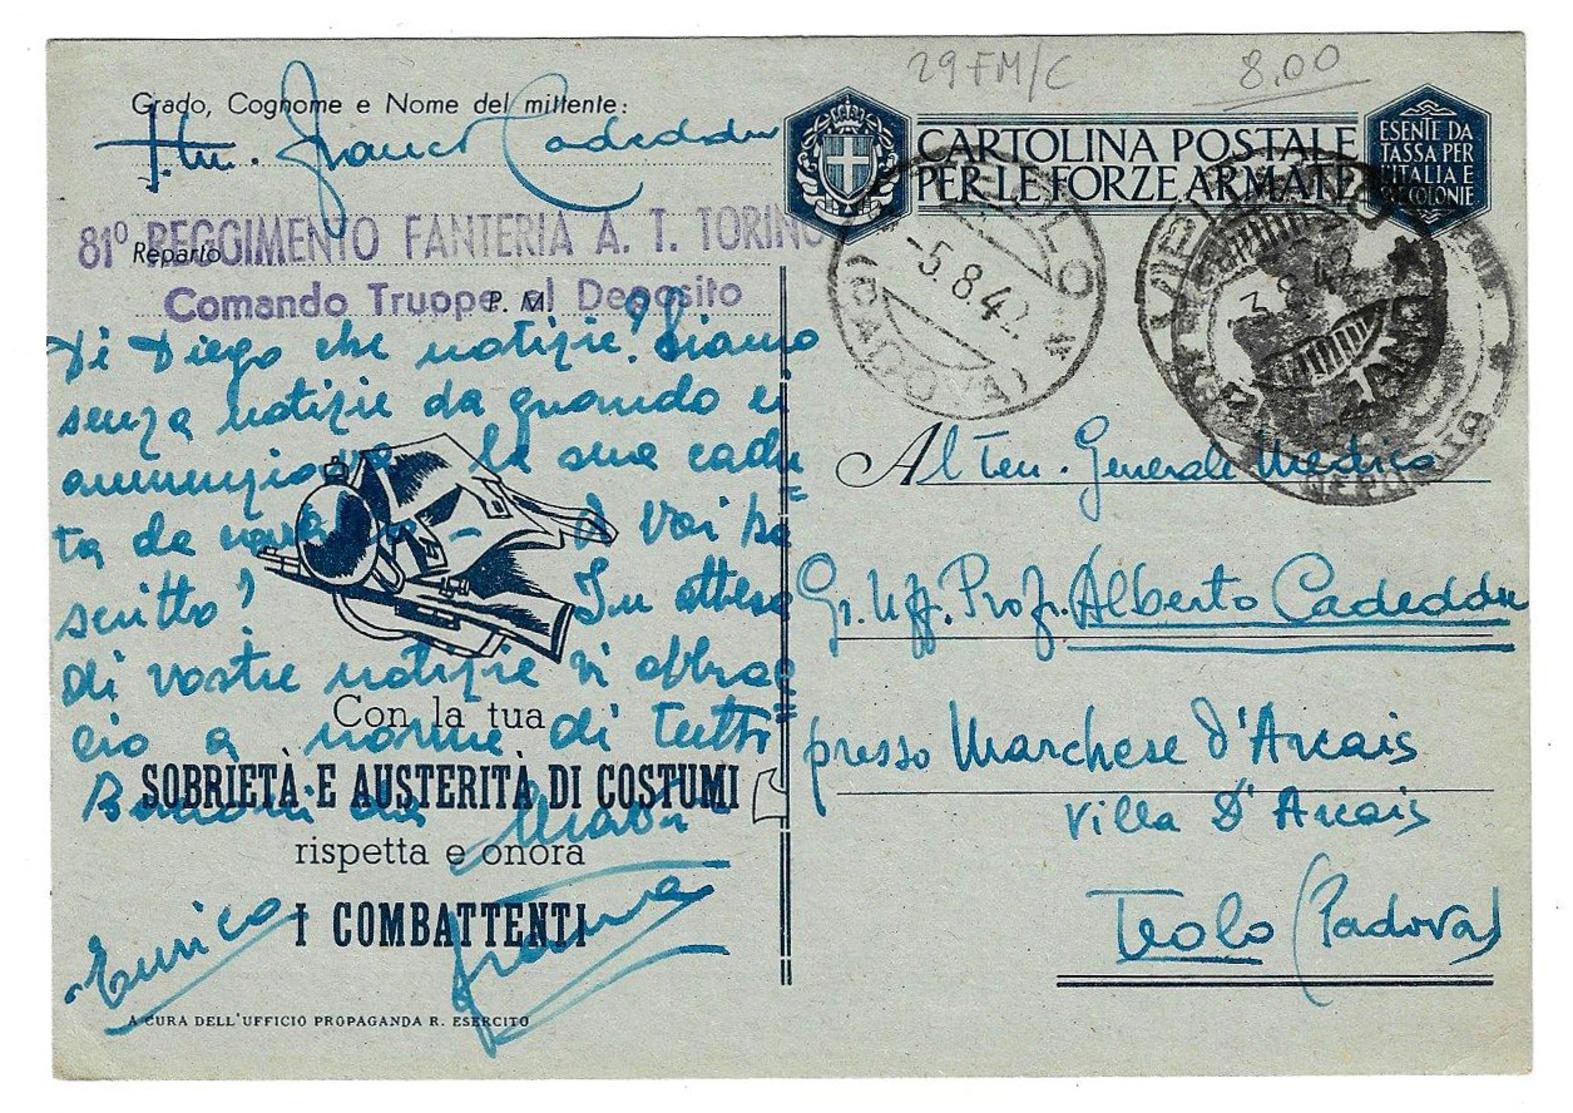 Cartolina Postale Per Le Forze Armate - Posta Militare - 29 FM/C/1. 1942 - 1900-44 Vittorio Emanuele III